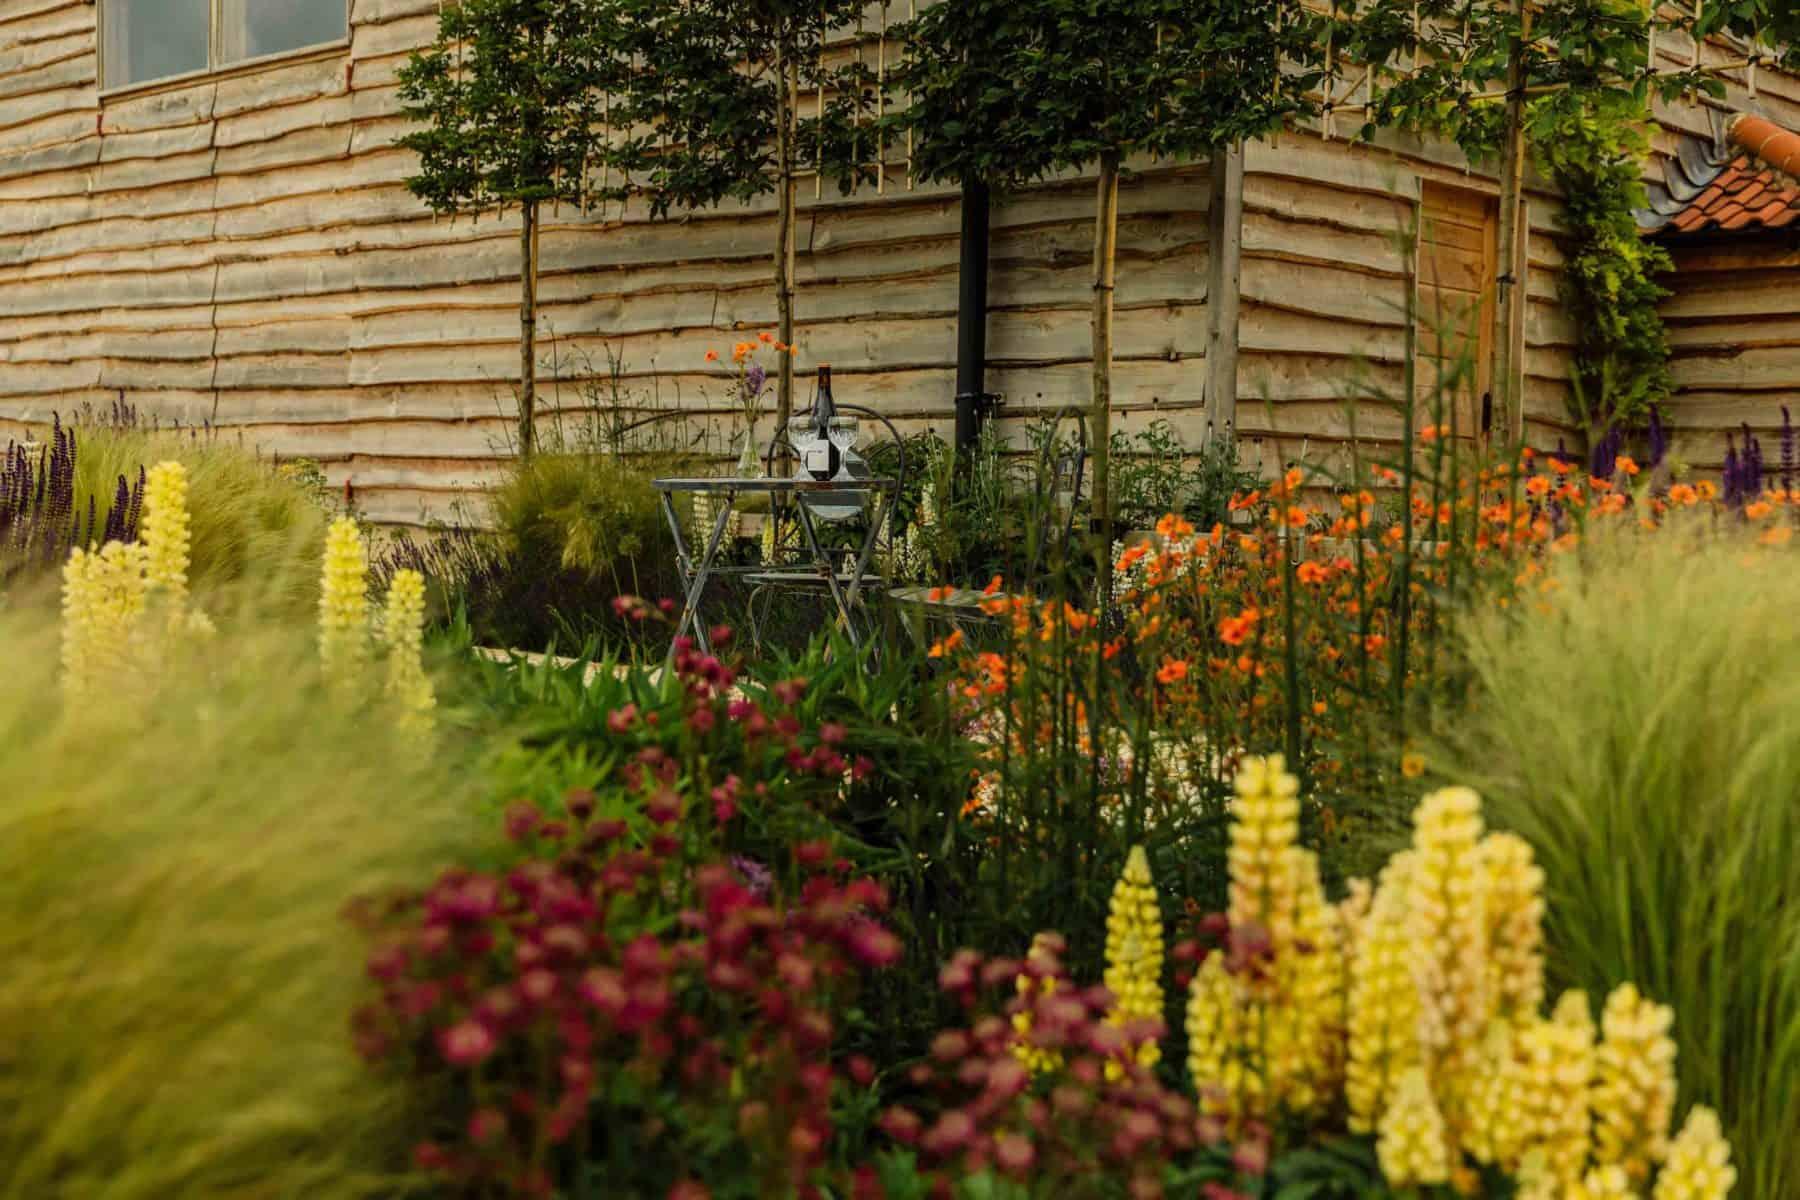 Rustic Country Garden